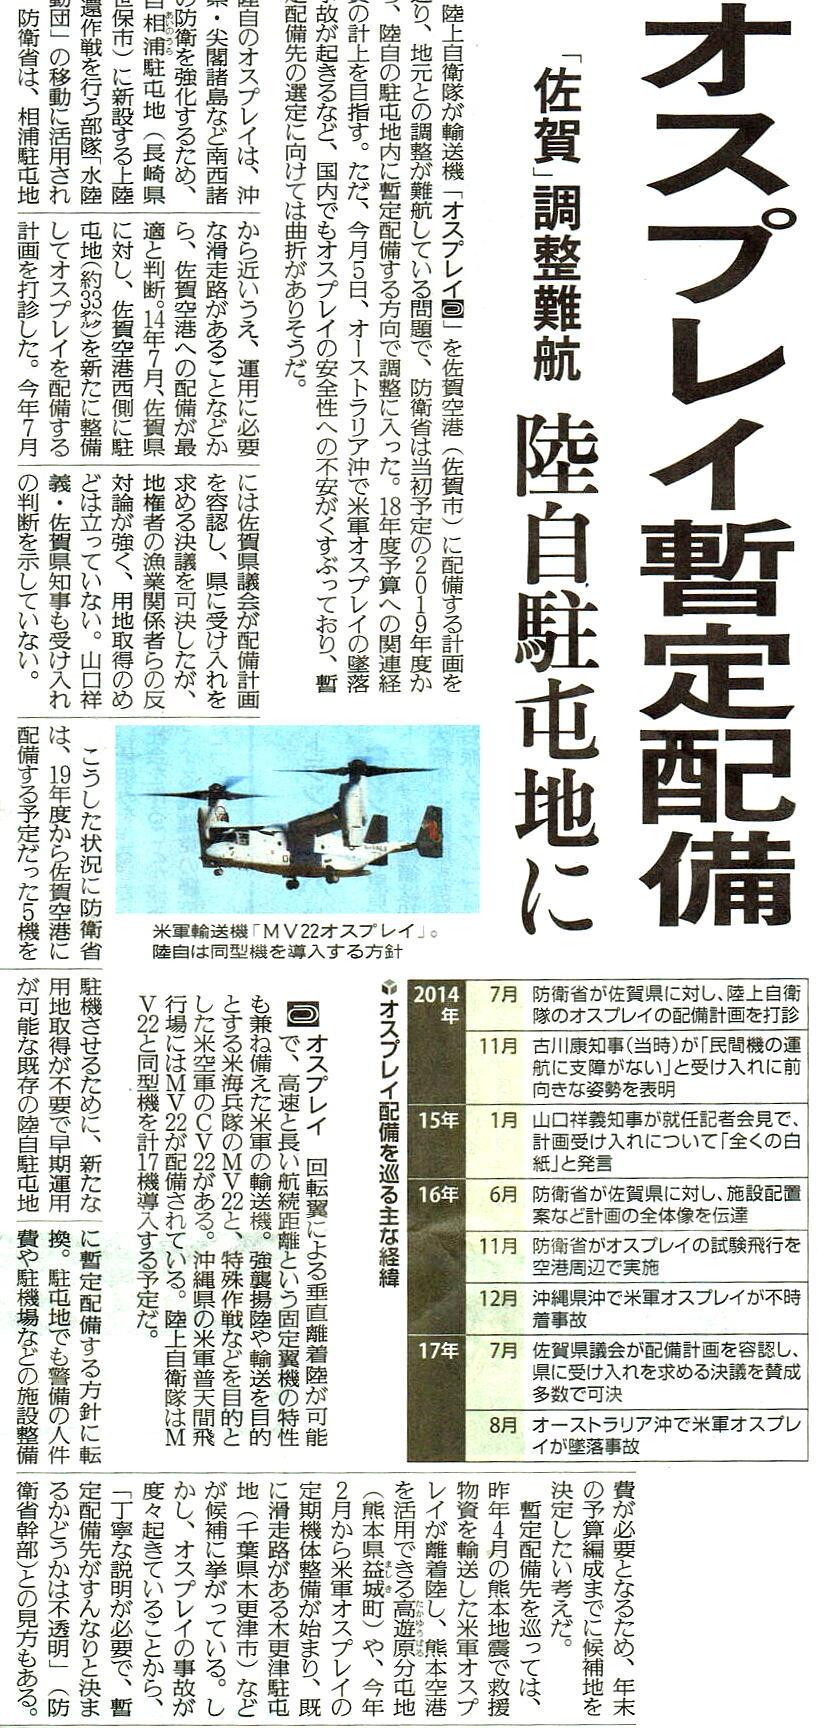 yomiuri2017 0821